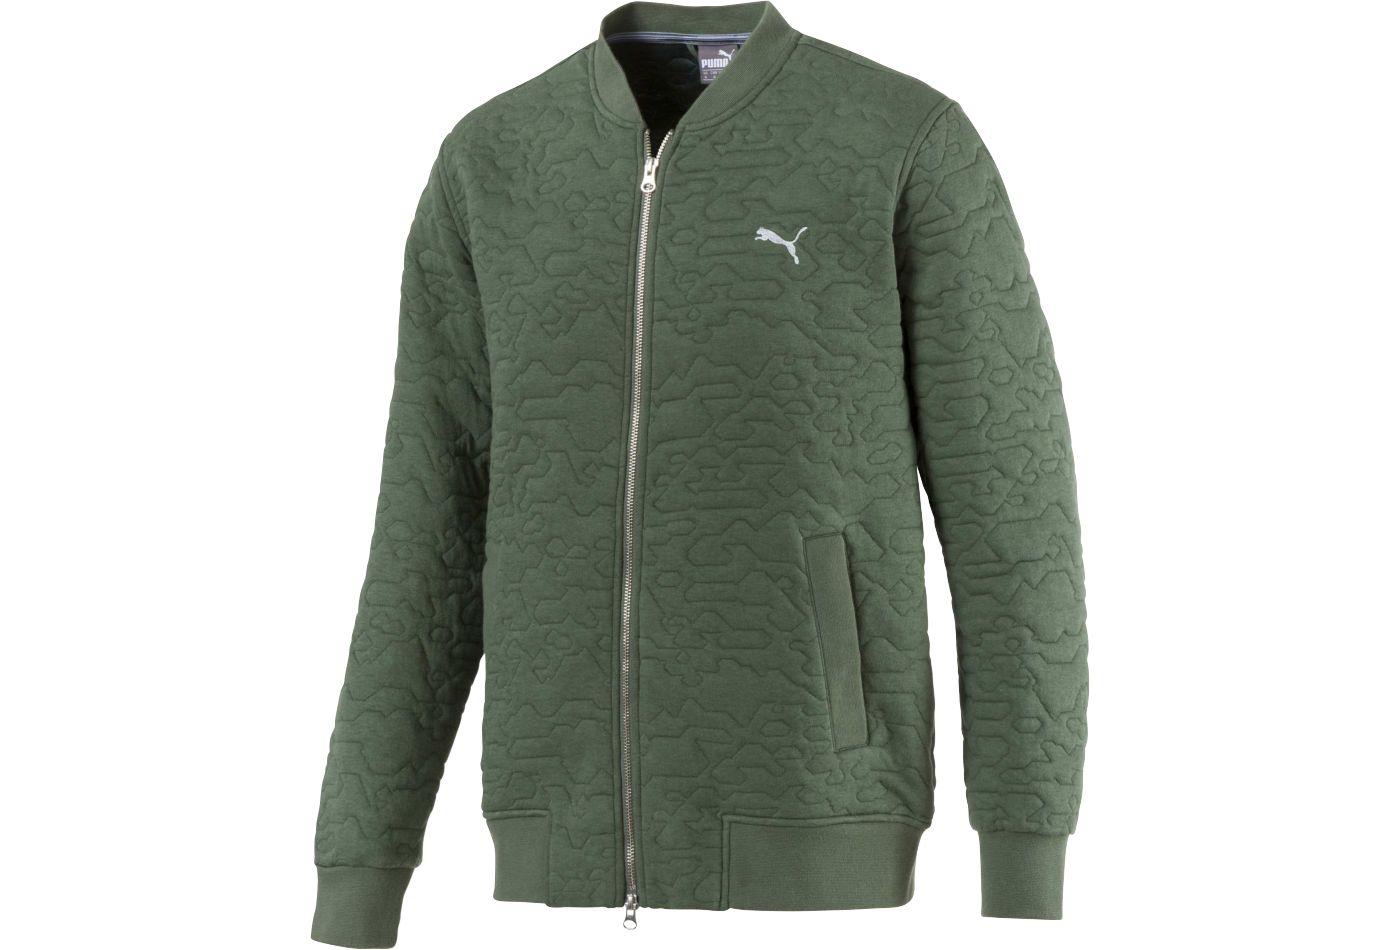 PUMA Men's Camo Golf Bomber Jacket